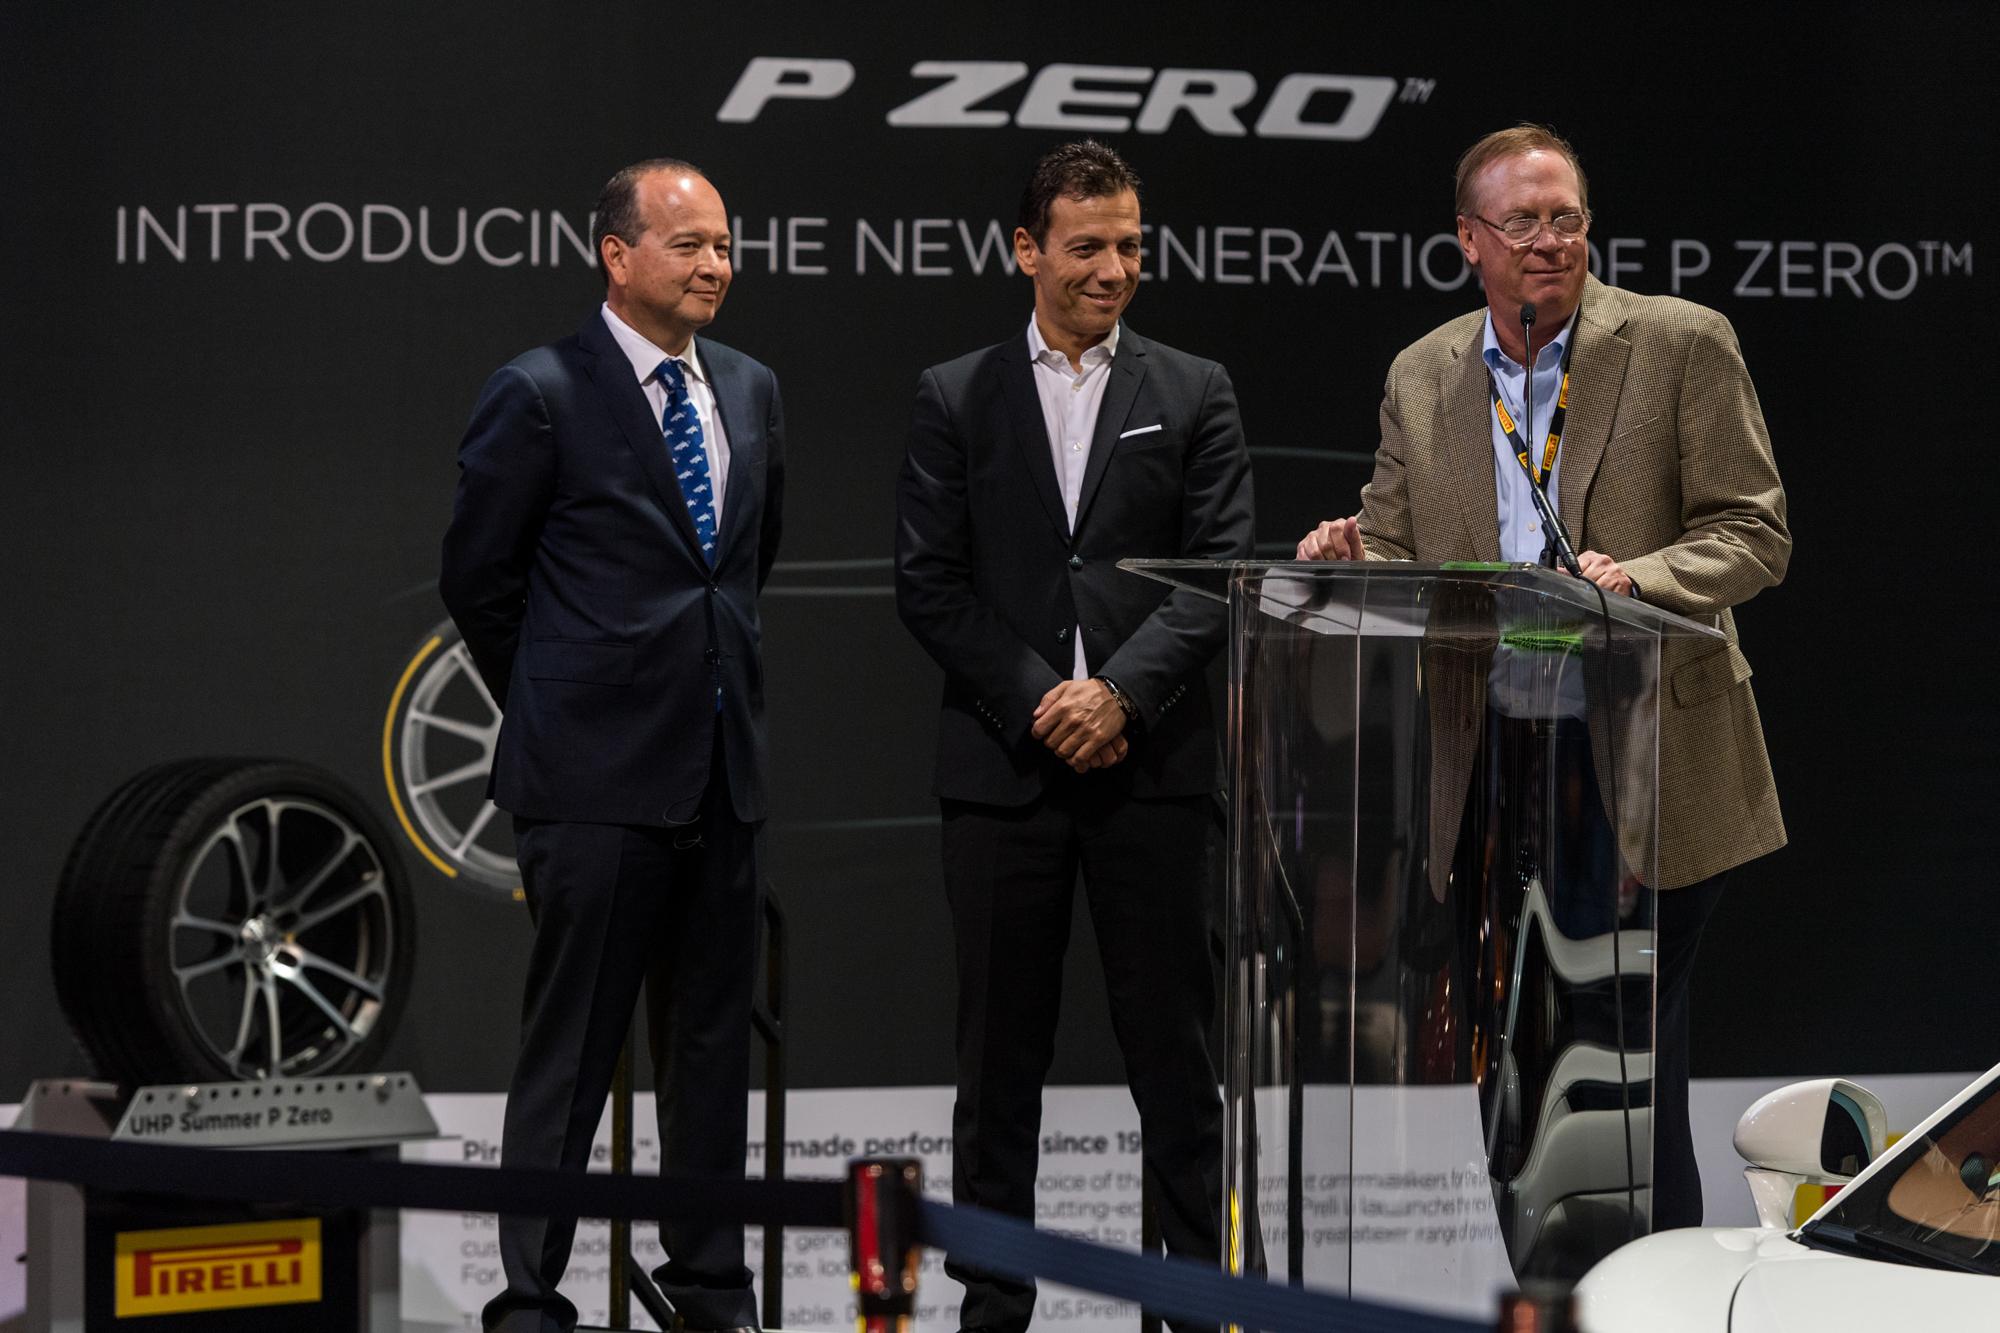 Pirelli at SEMA show 2017